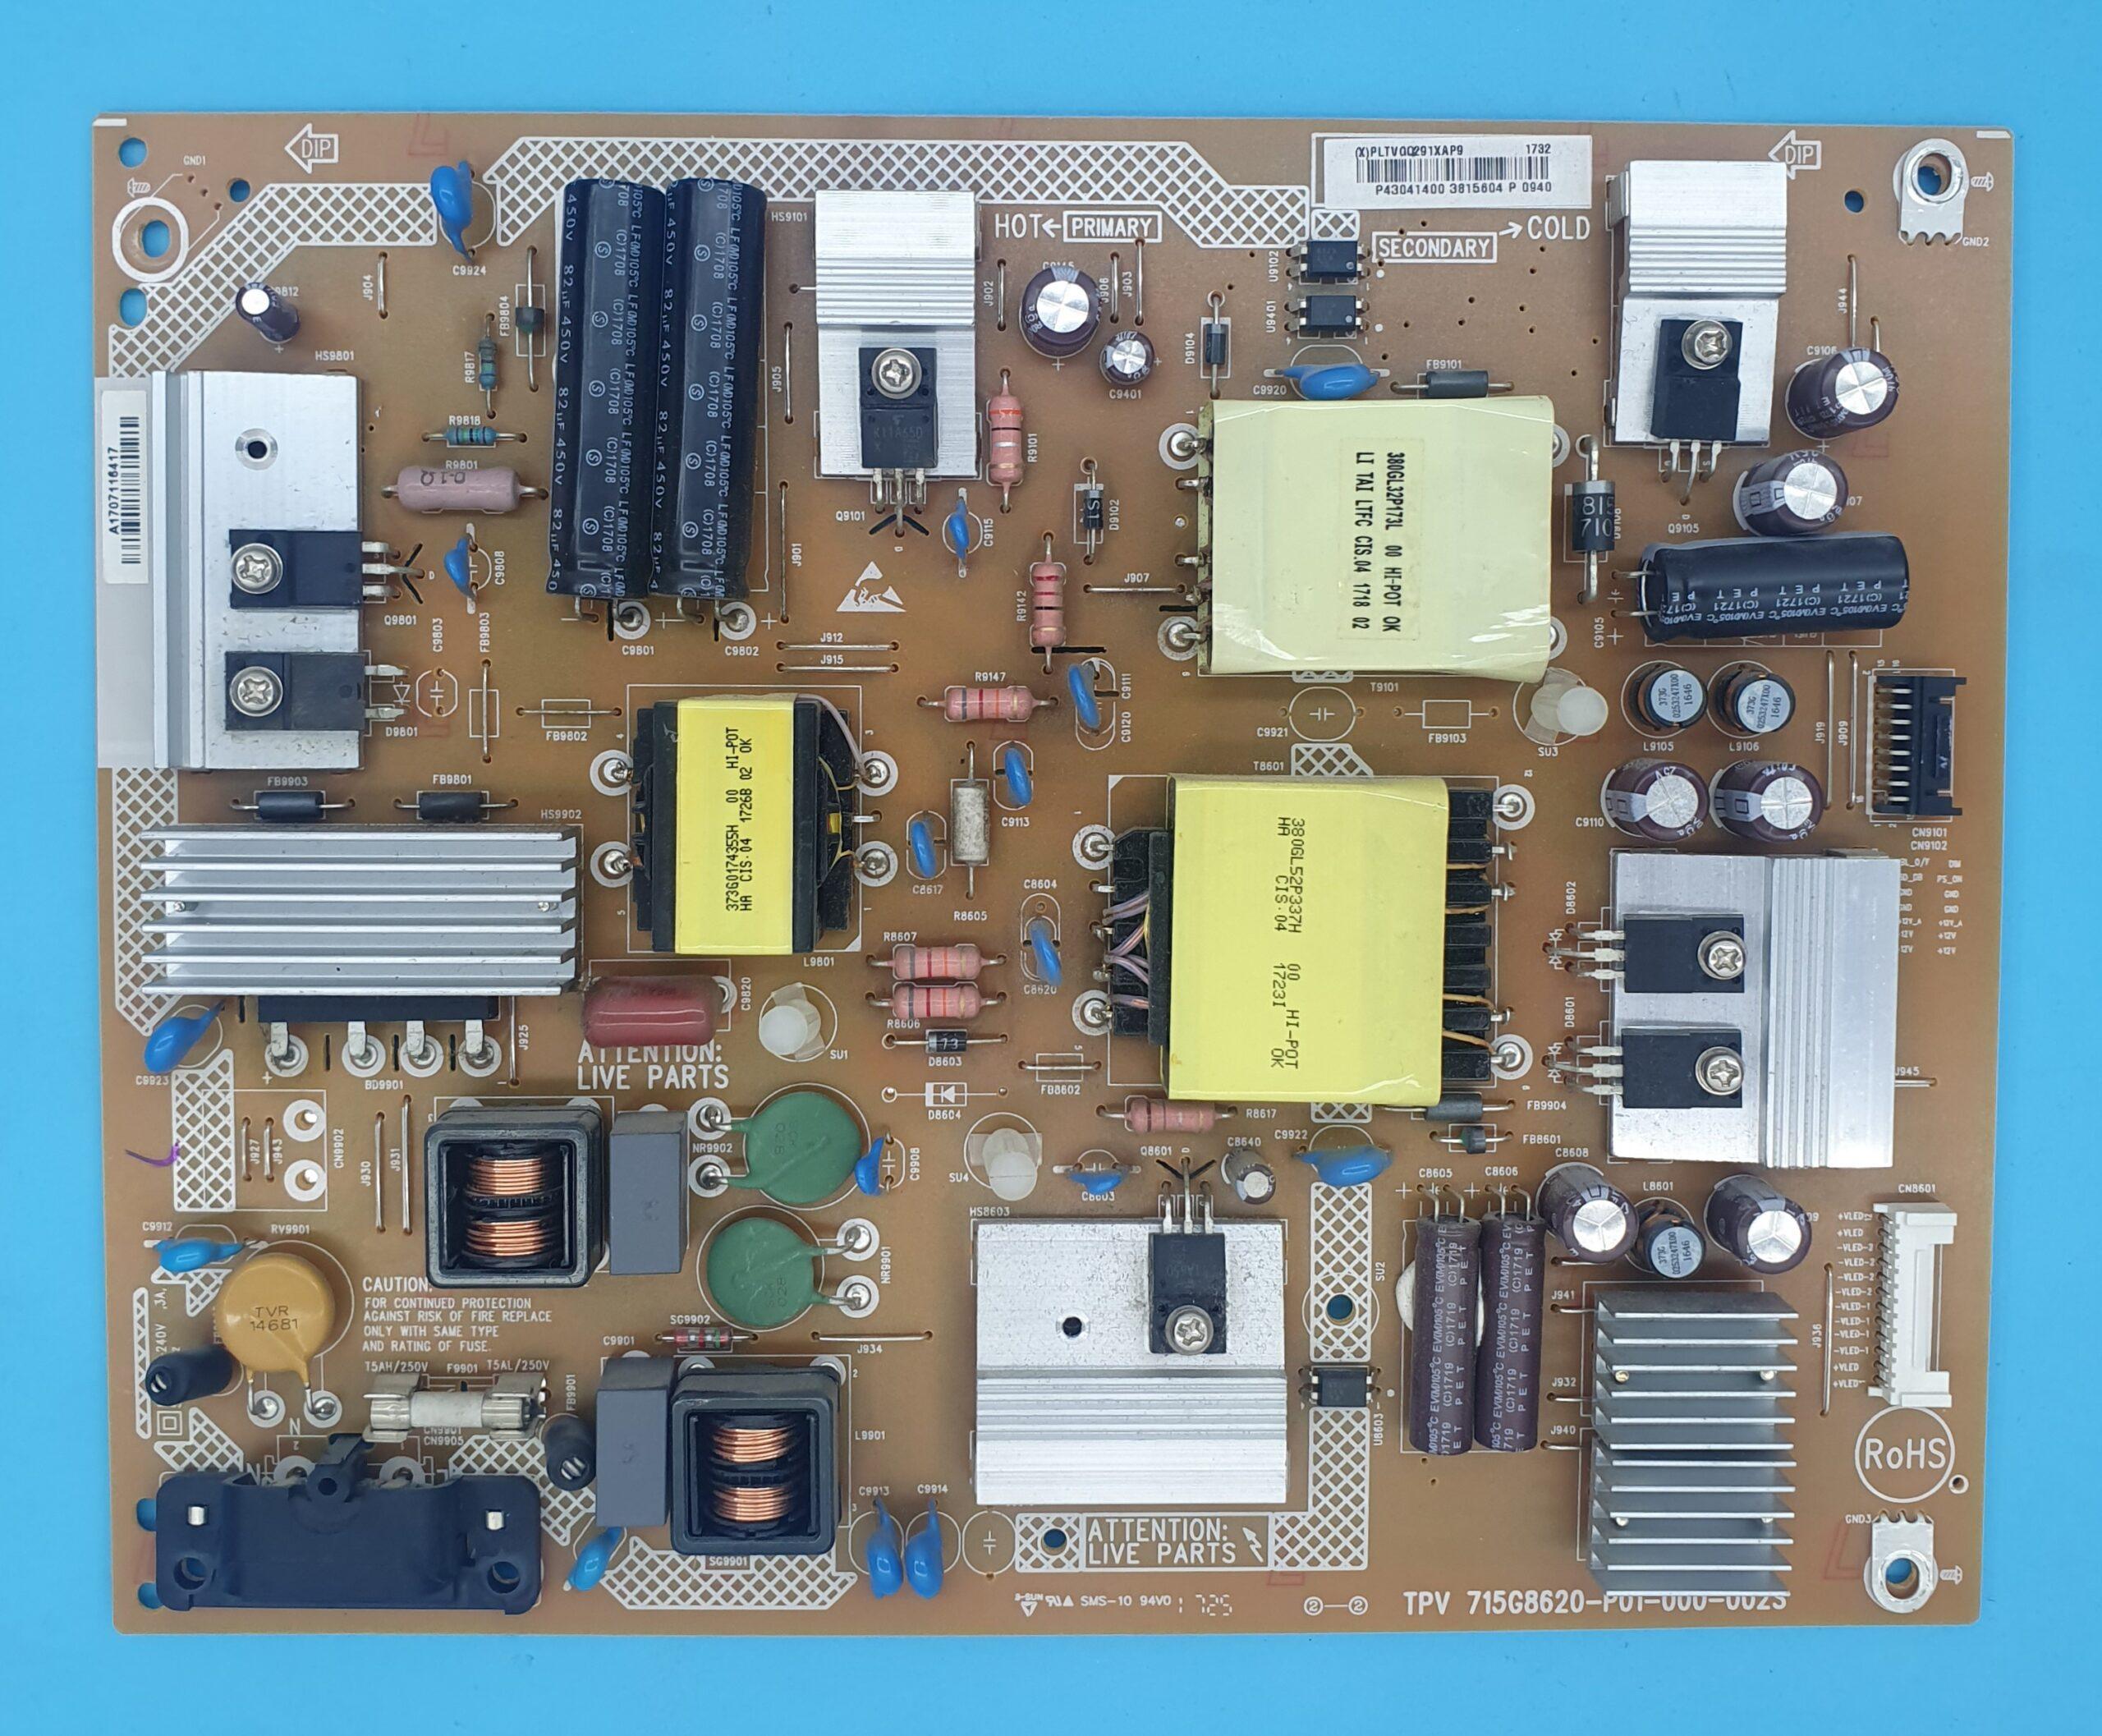 715G8620-P01-000-002S Phlips Power Kart (KDV DAHİL = 200 TL)